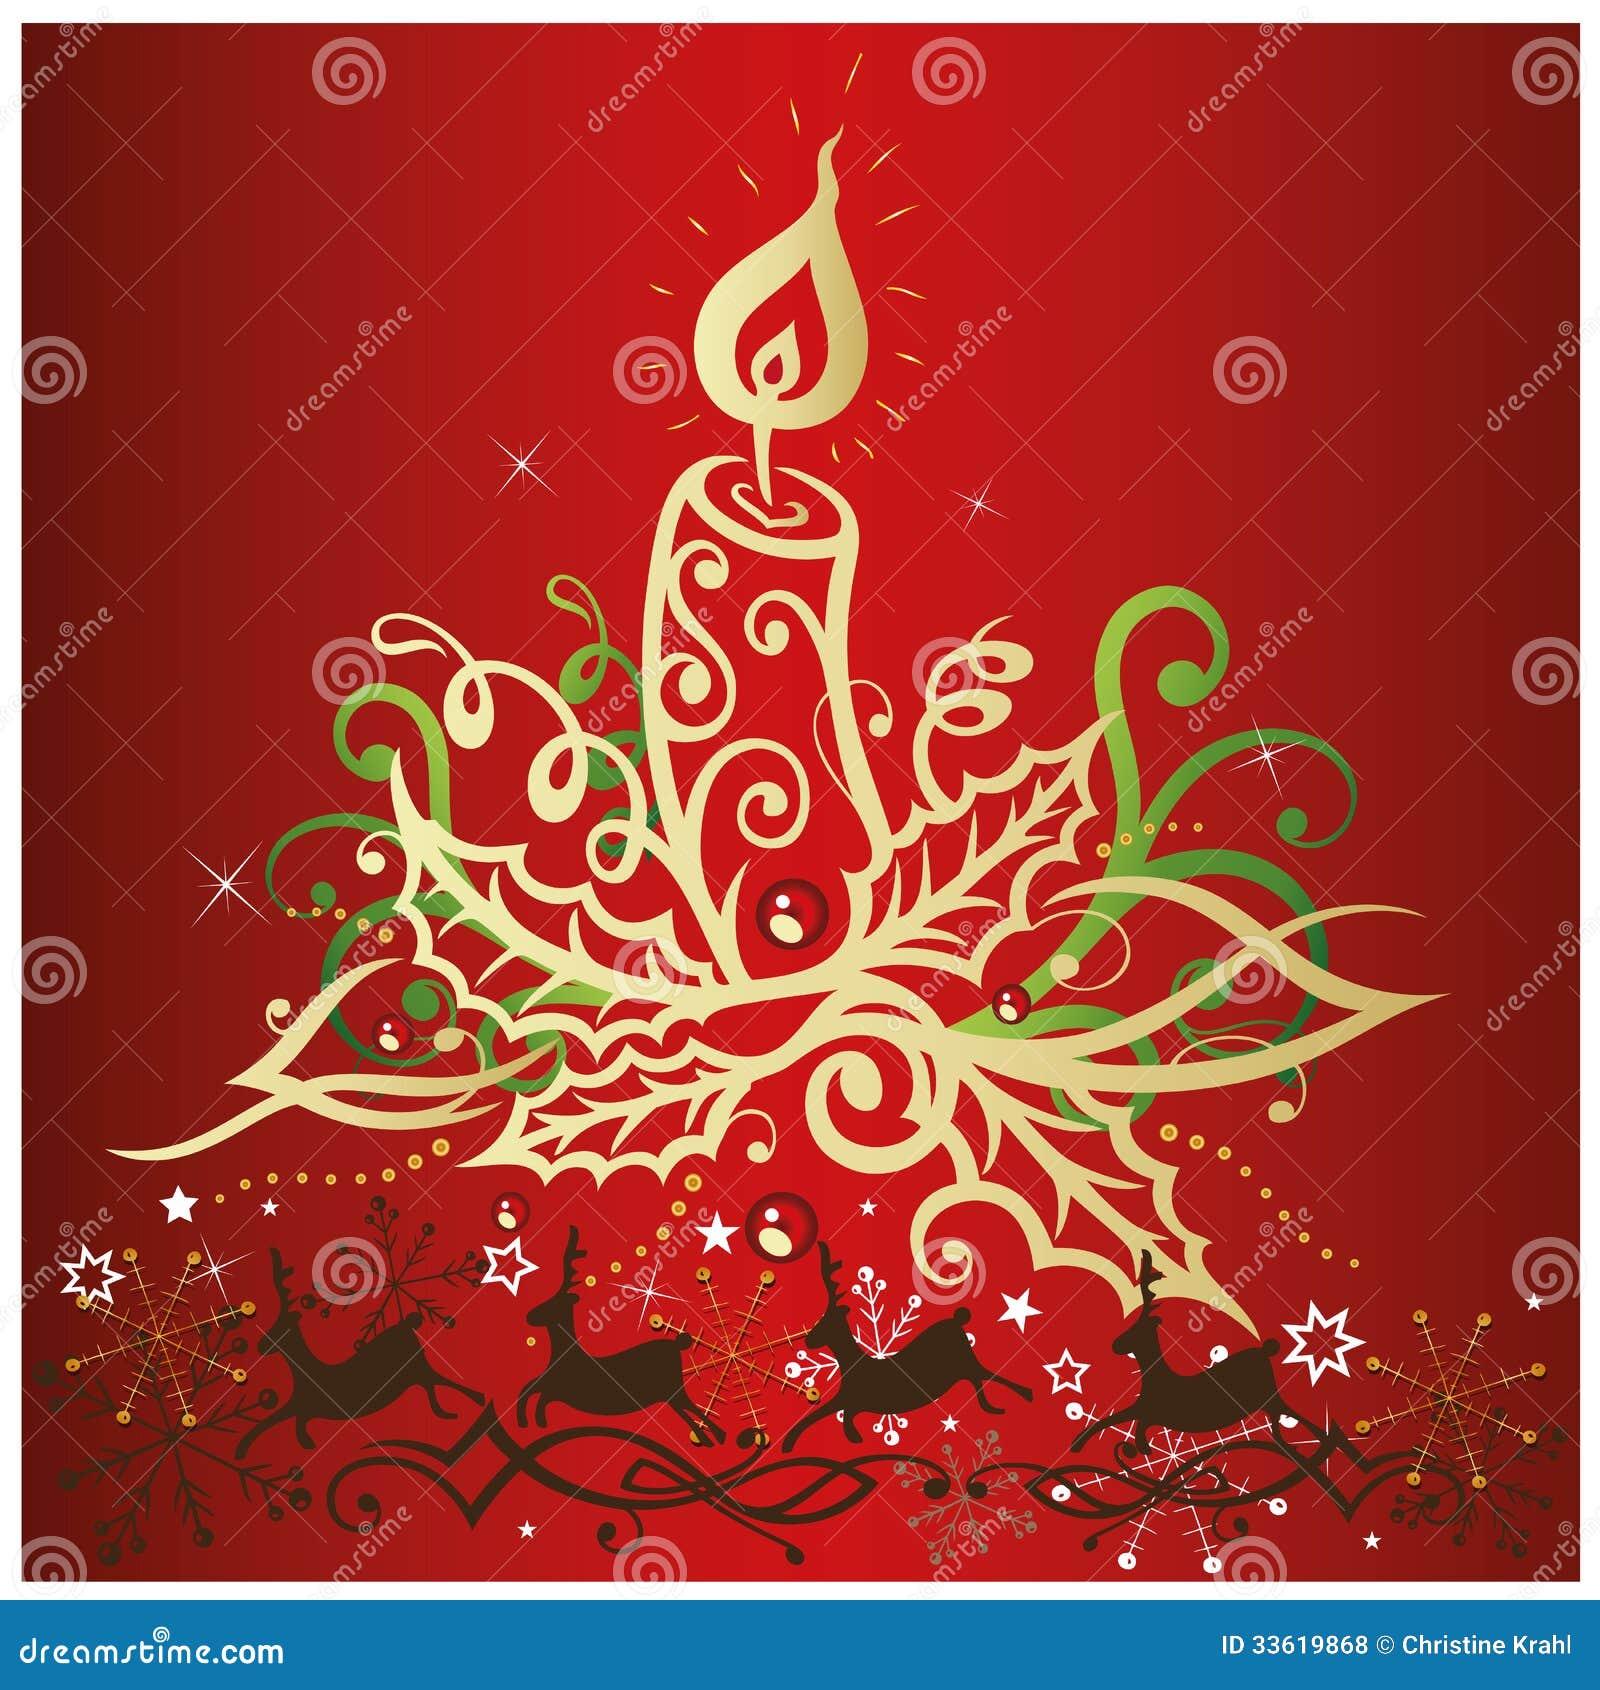 Merry christmas gift 4 - 5 3